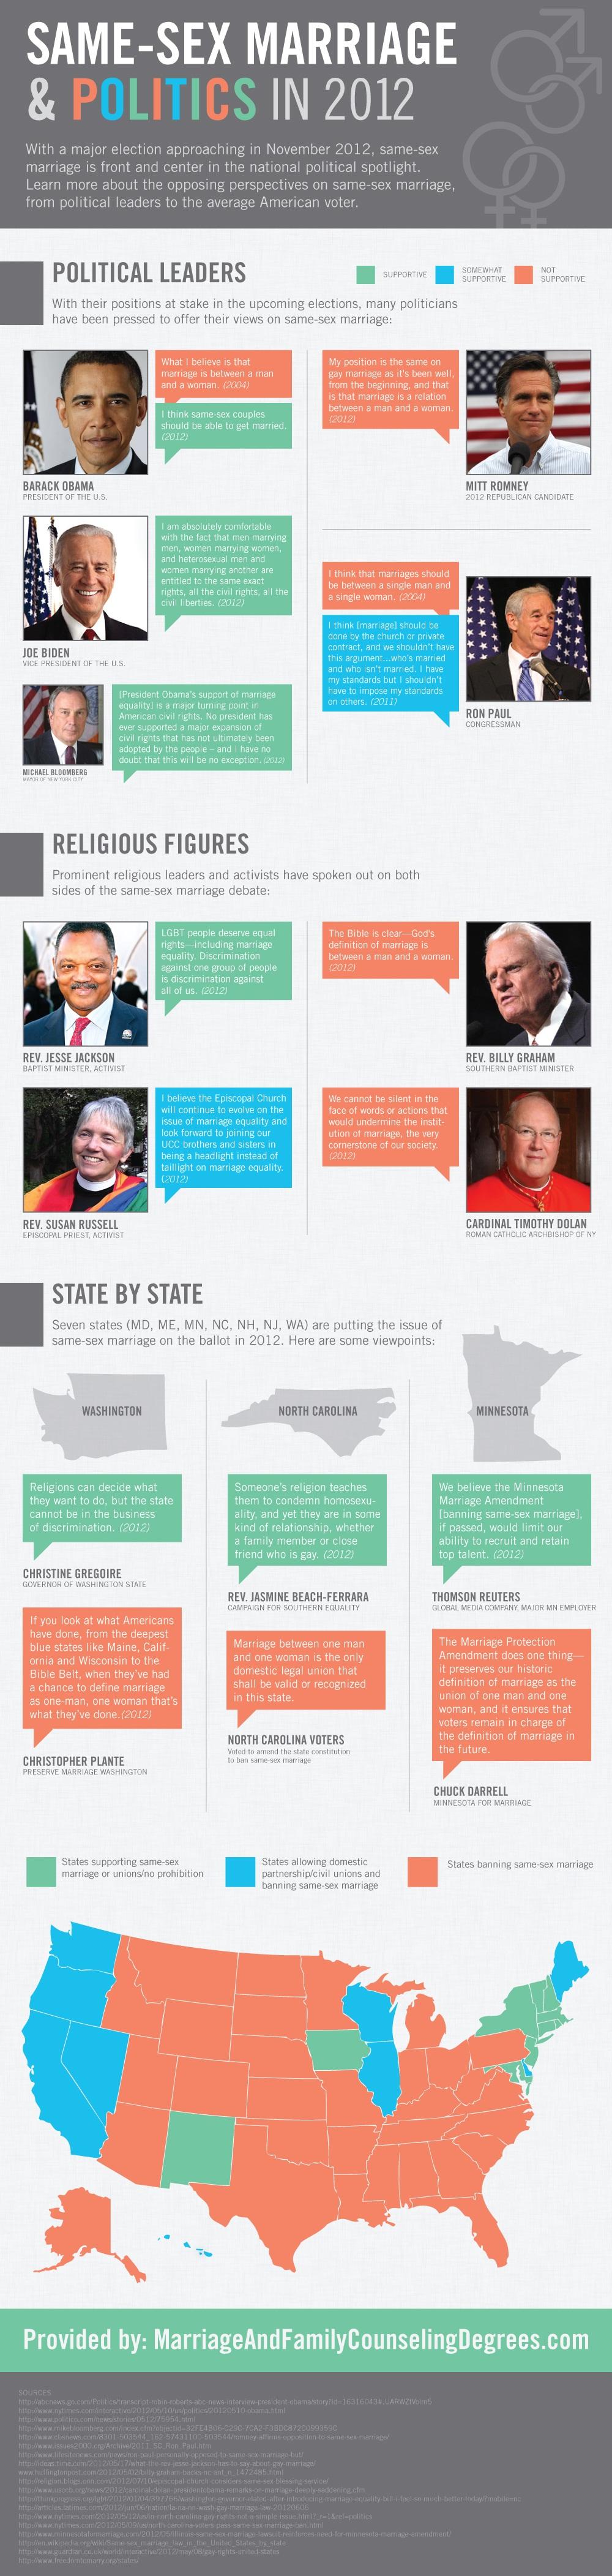 samesex-marriage-and-politics-in-2012_504618b31c0f7